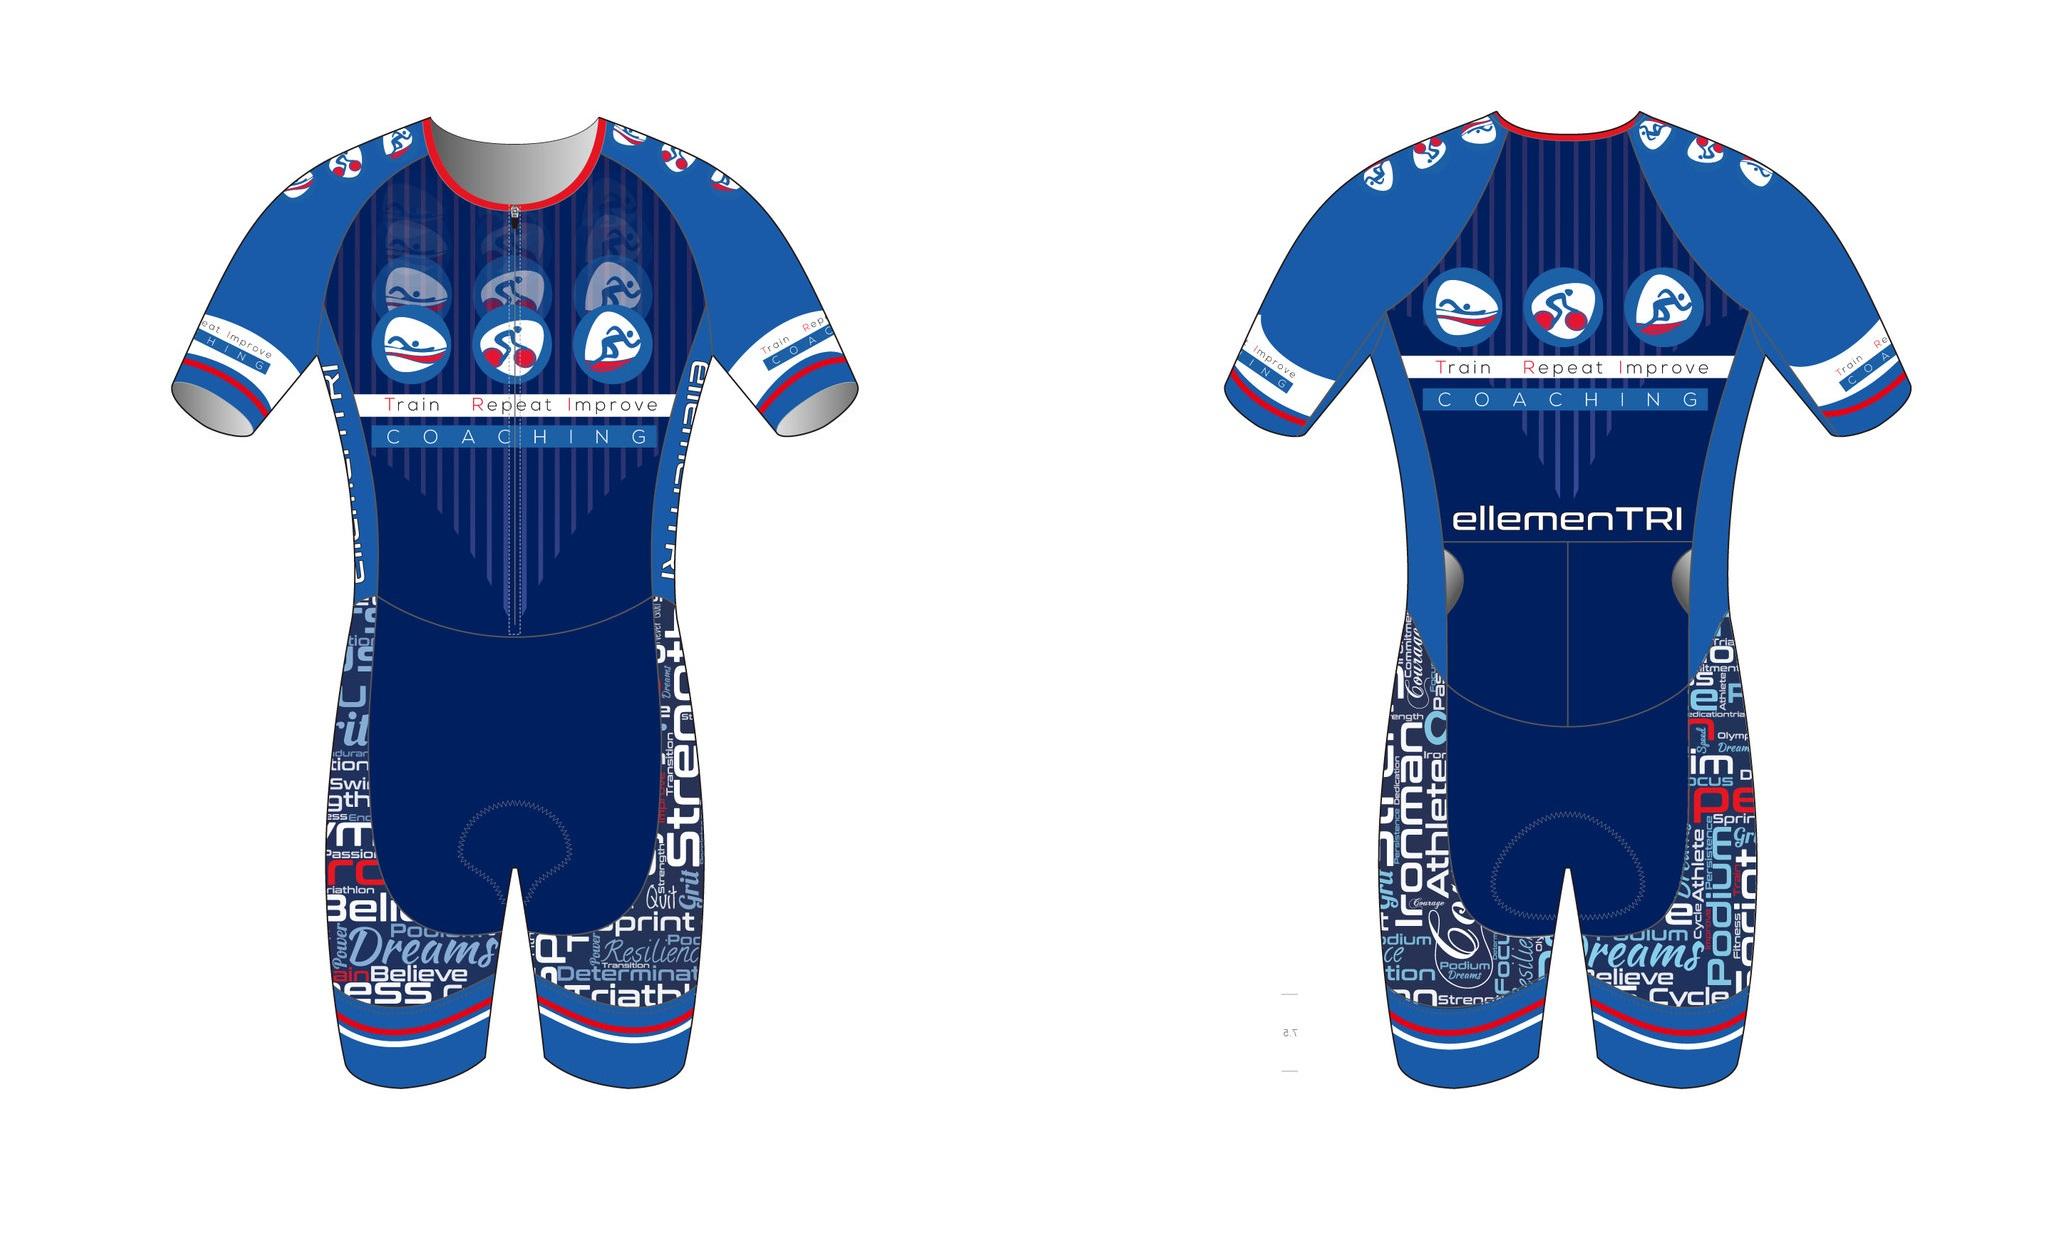 SD+Short+Sleeve+Tri+Suit++Website+image.jpg